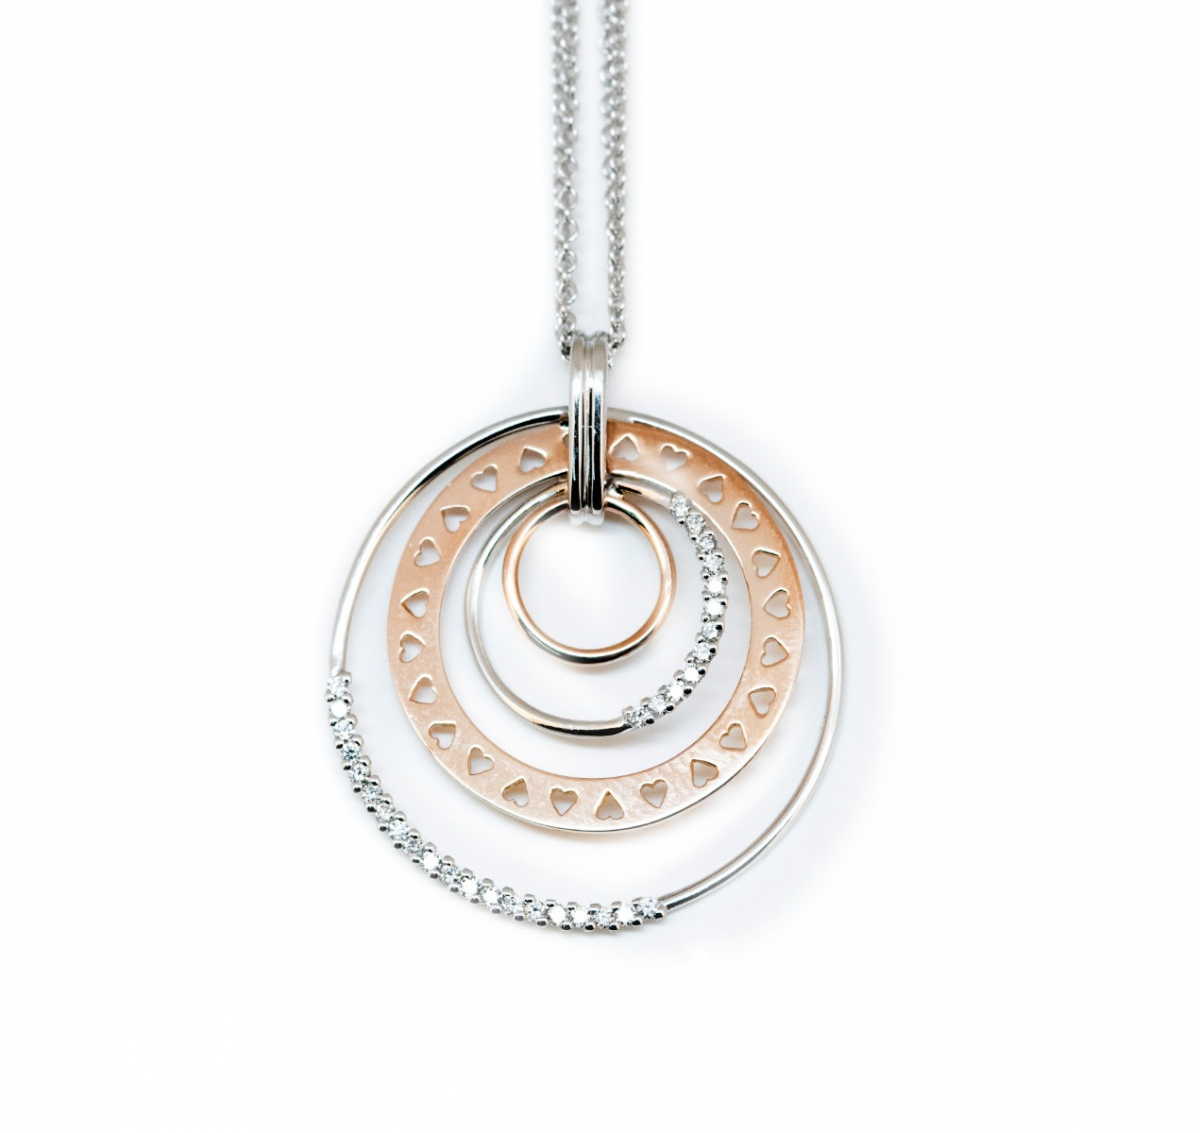 Four Circle Pendant Necklace with Diamonds